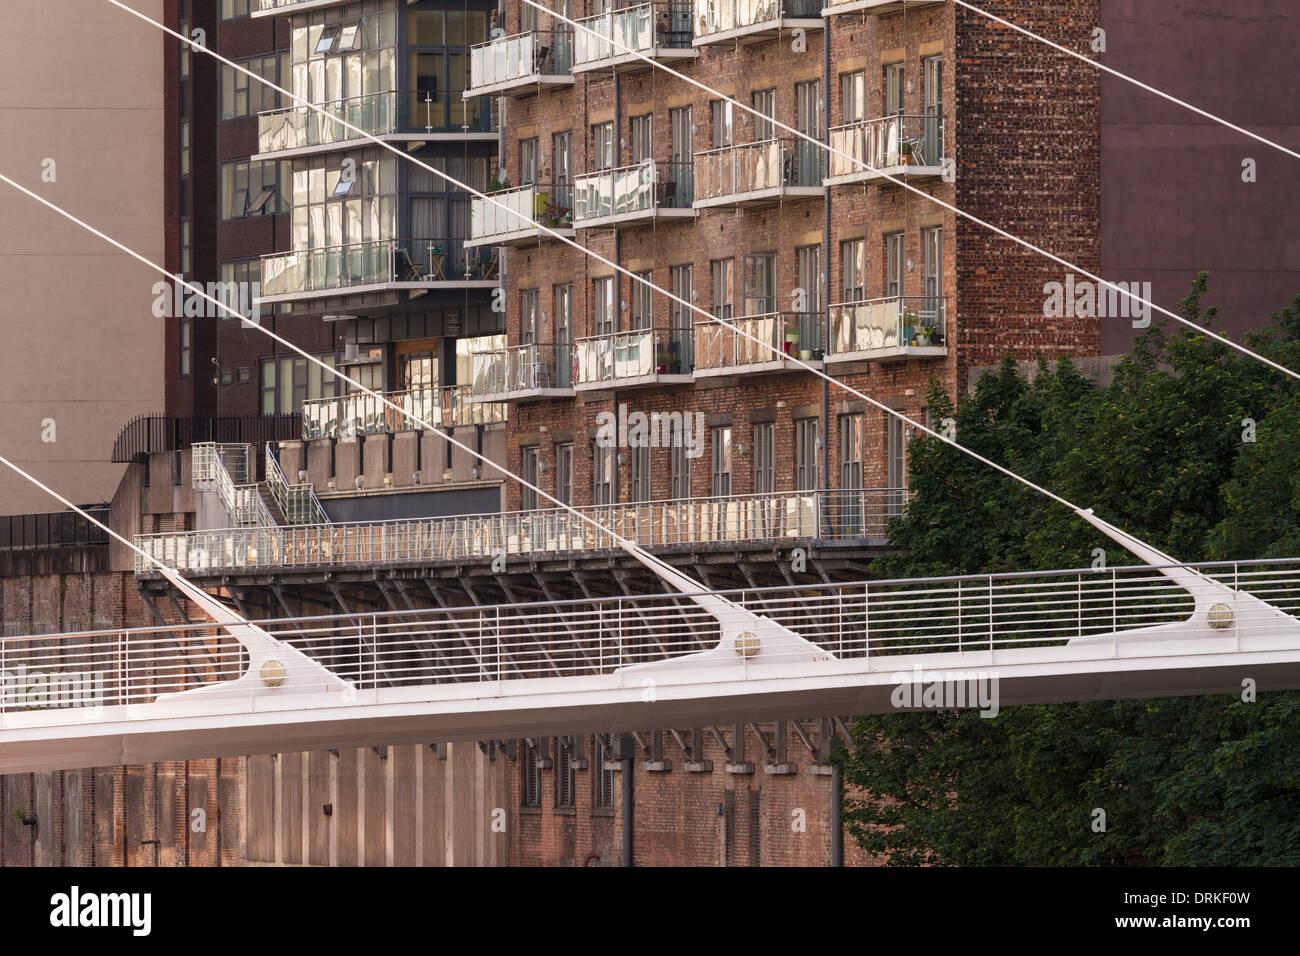 Trinity Bridge riverside apartments, Spinningfields, Manchester, England - Stock Image